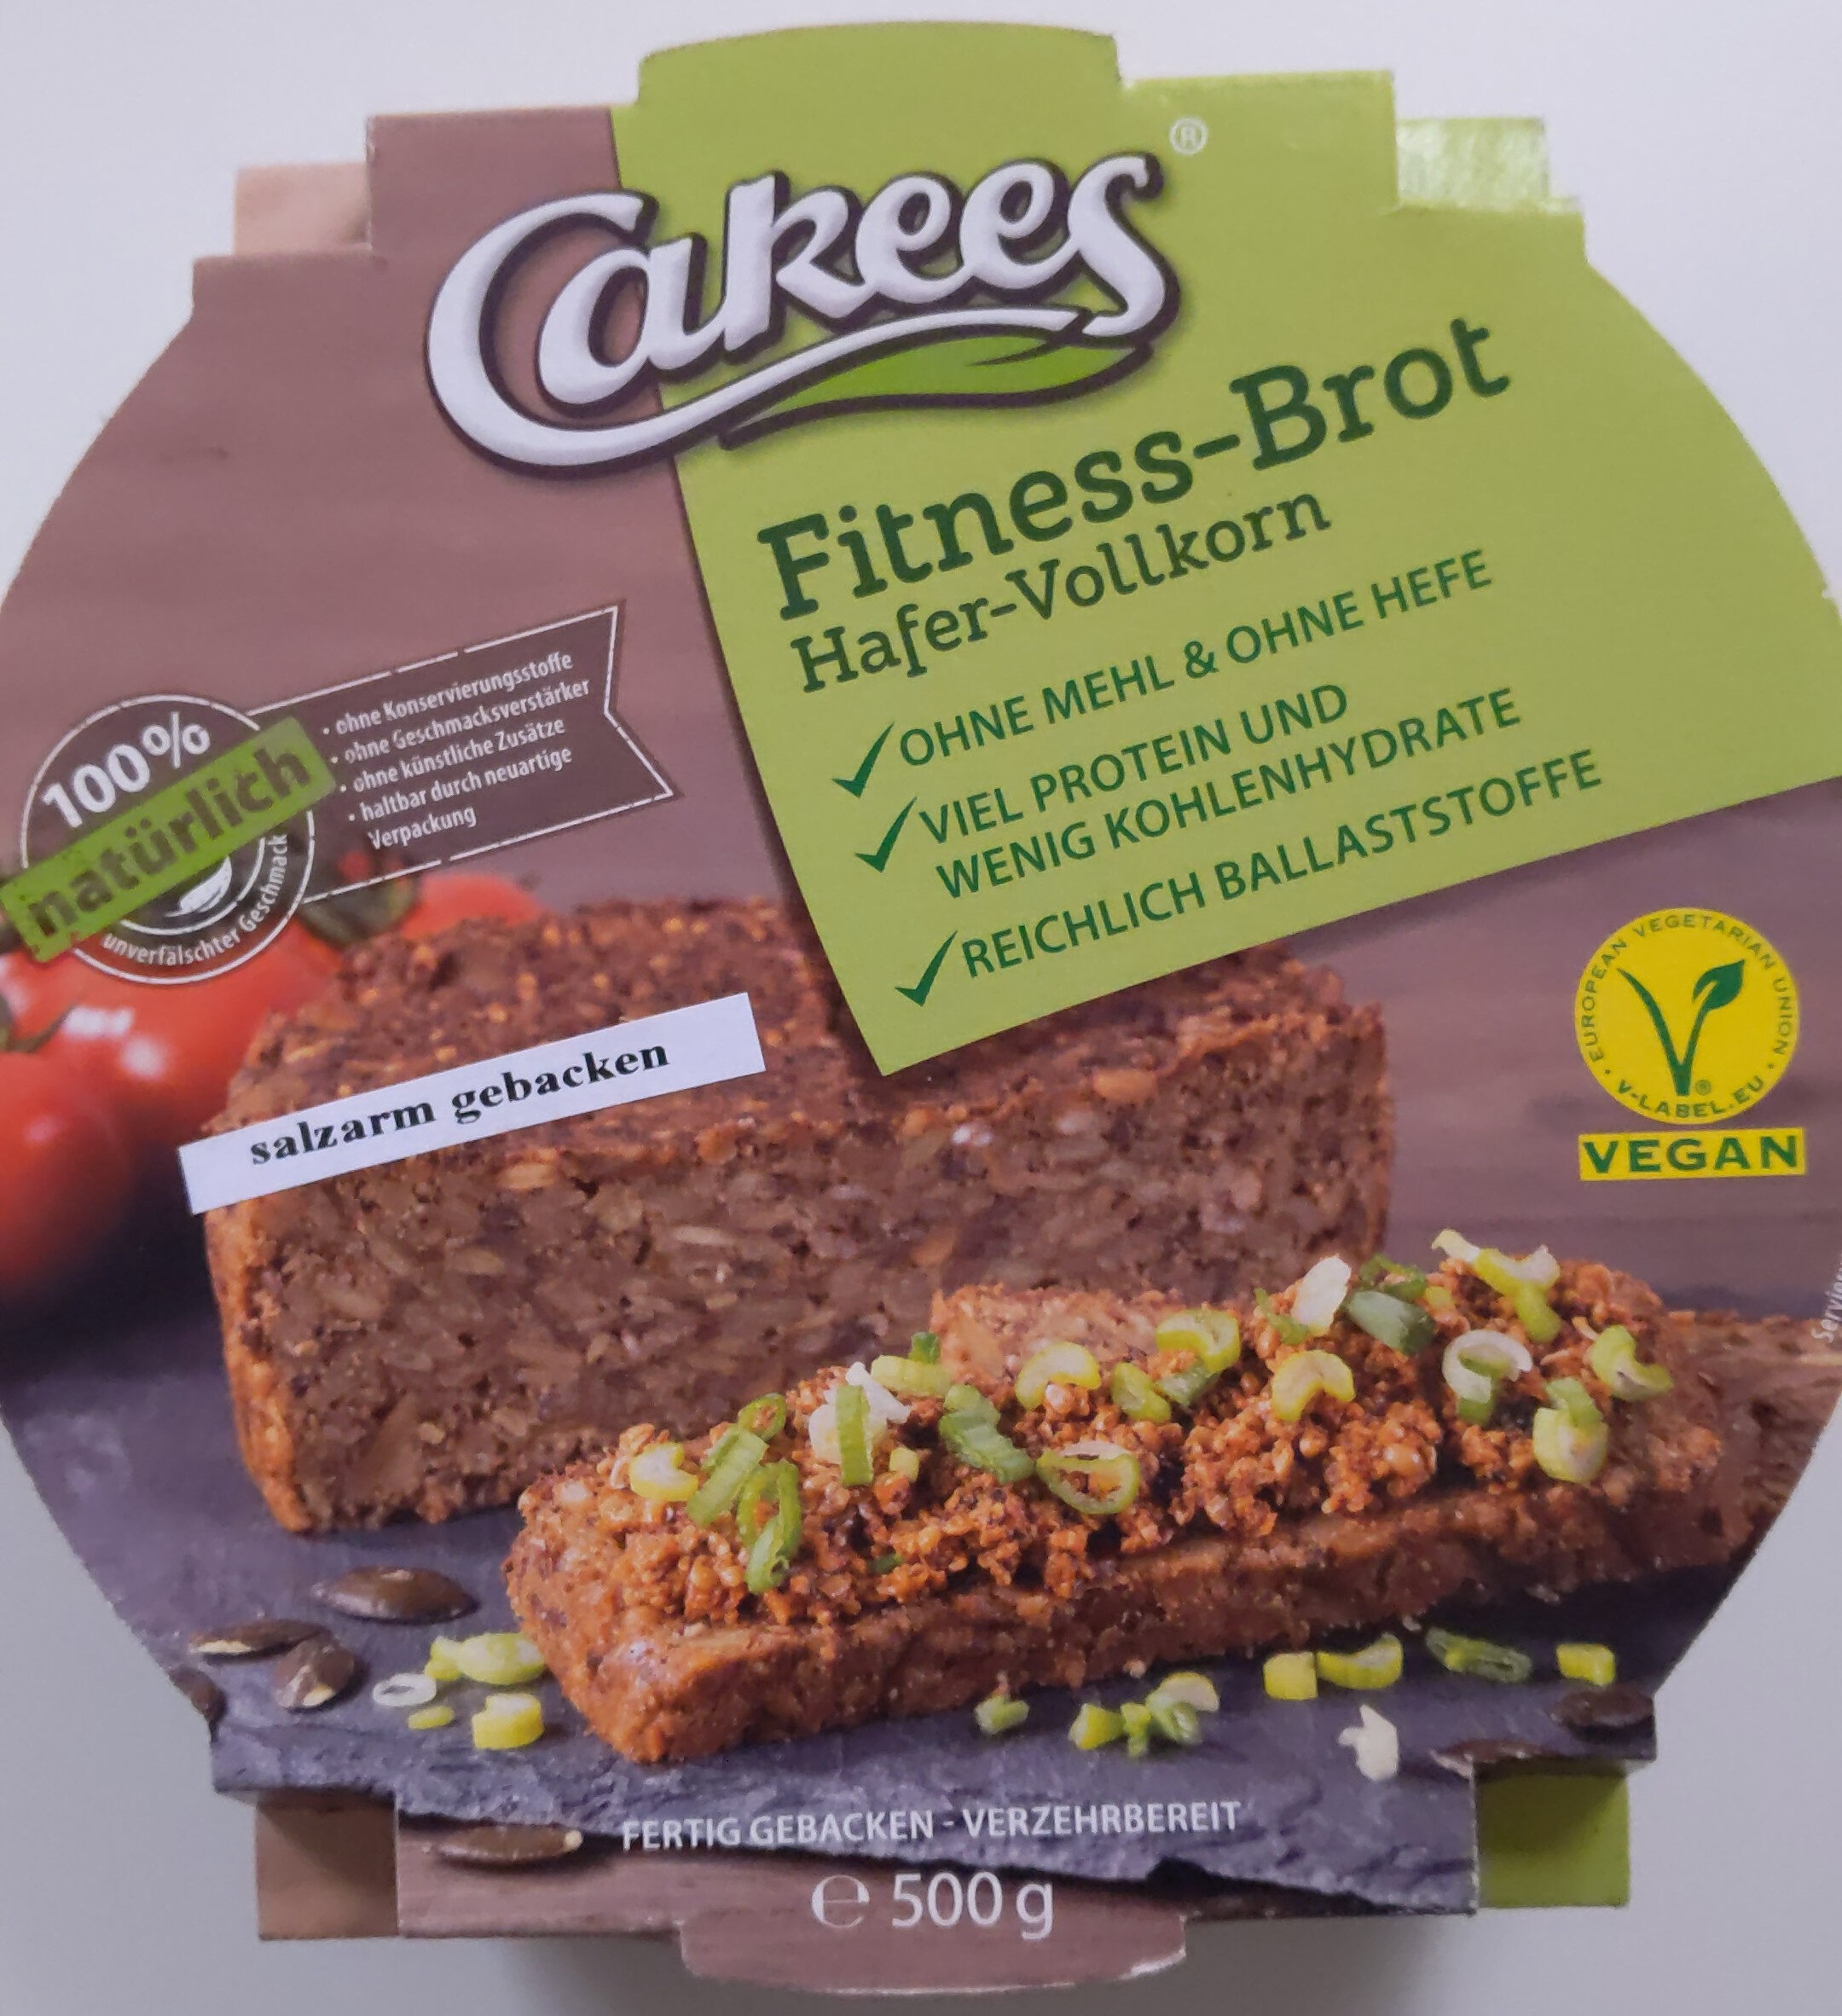 Fitness-Brot Hafer-Vollkorn - Product - de